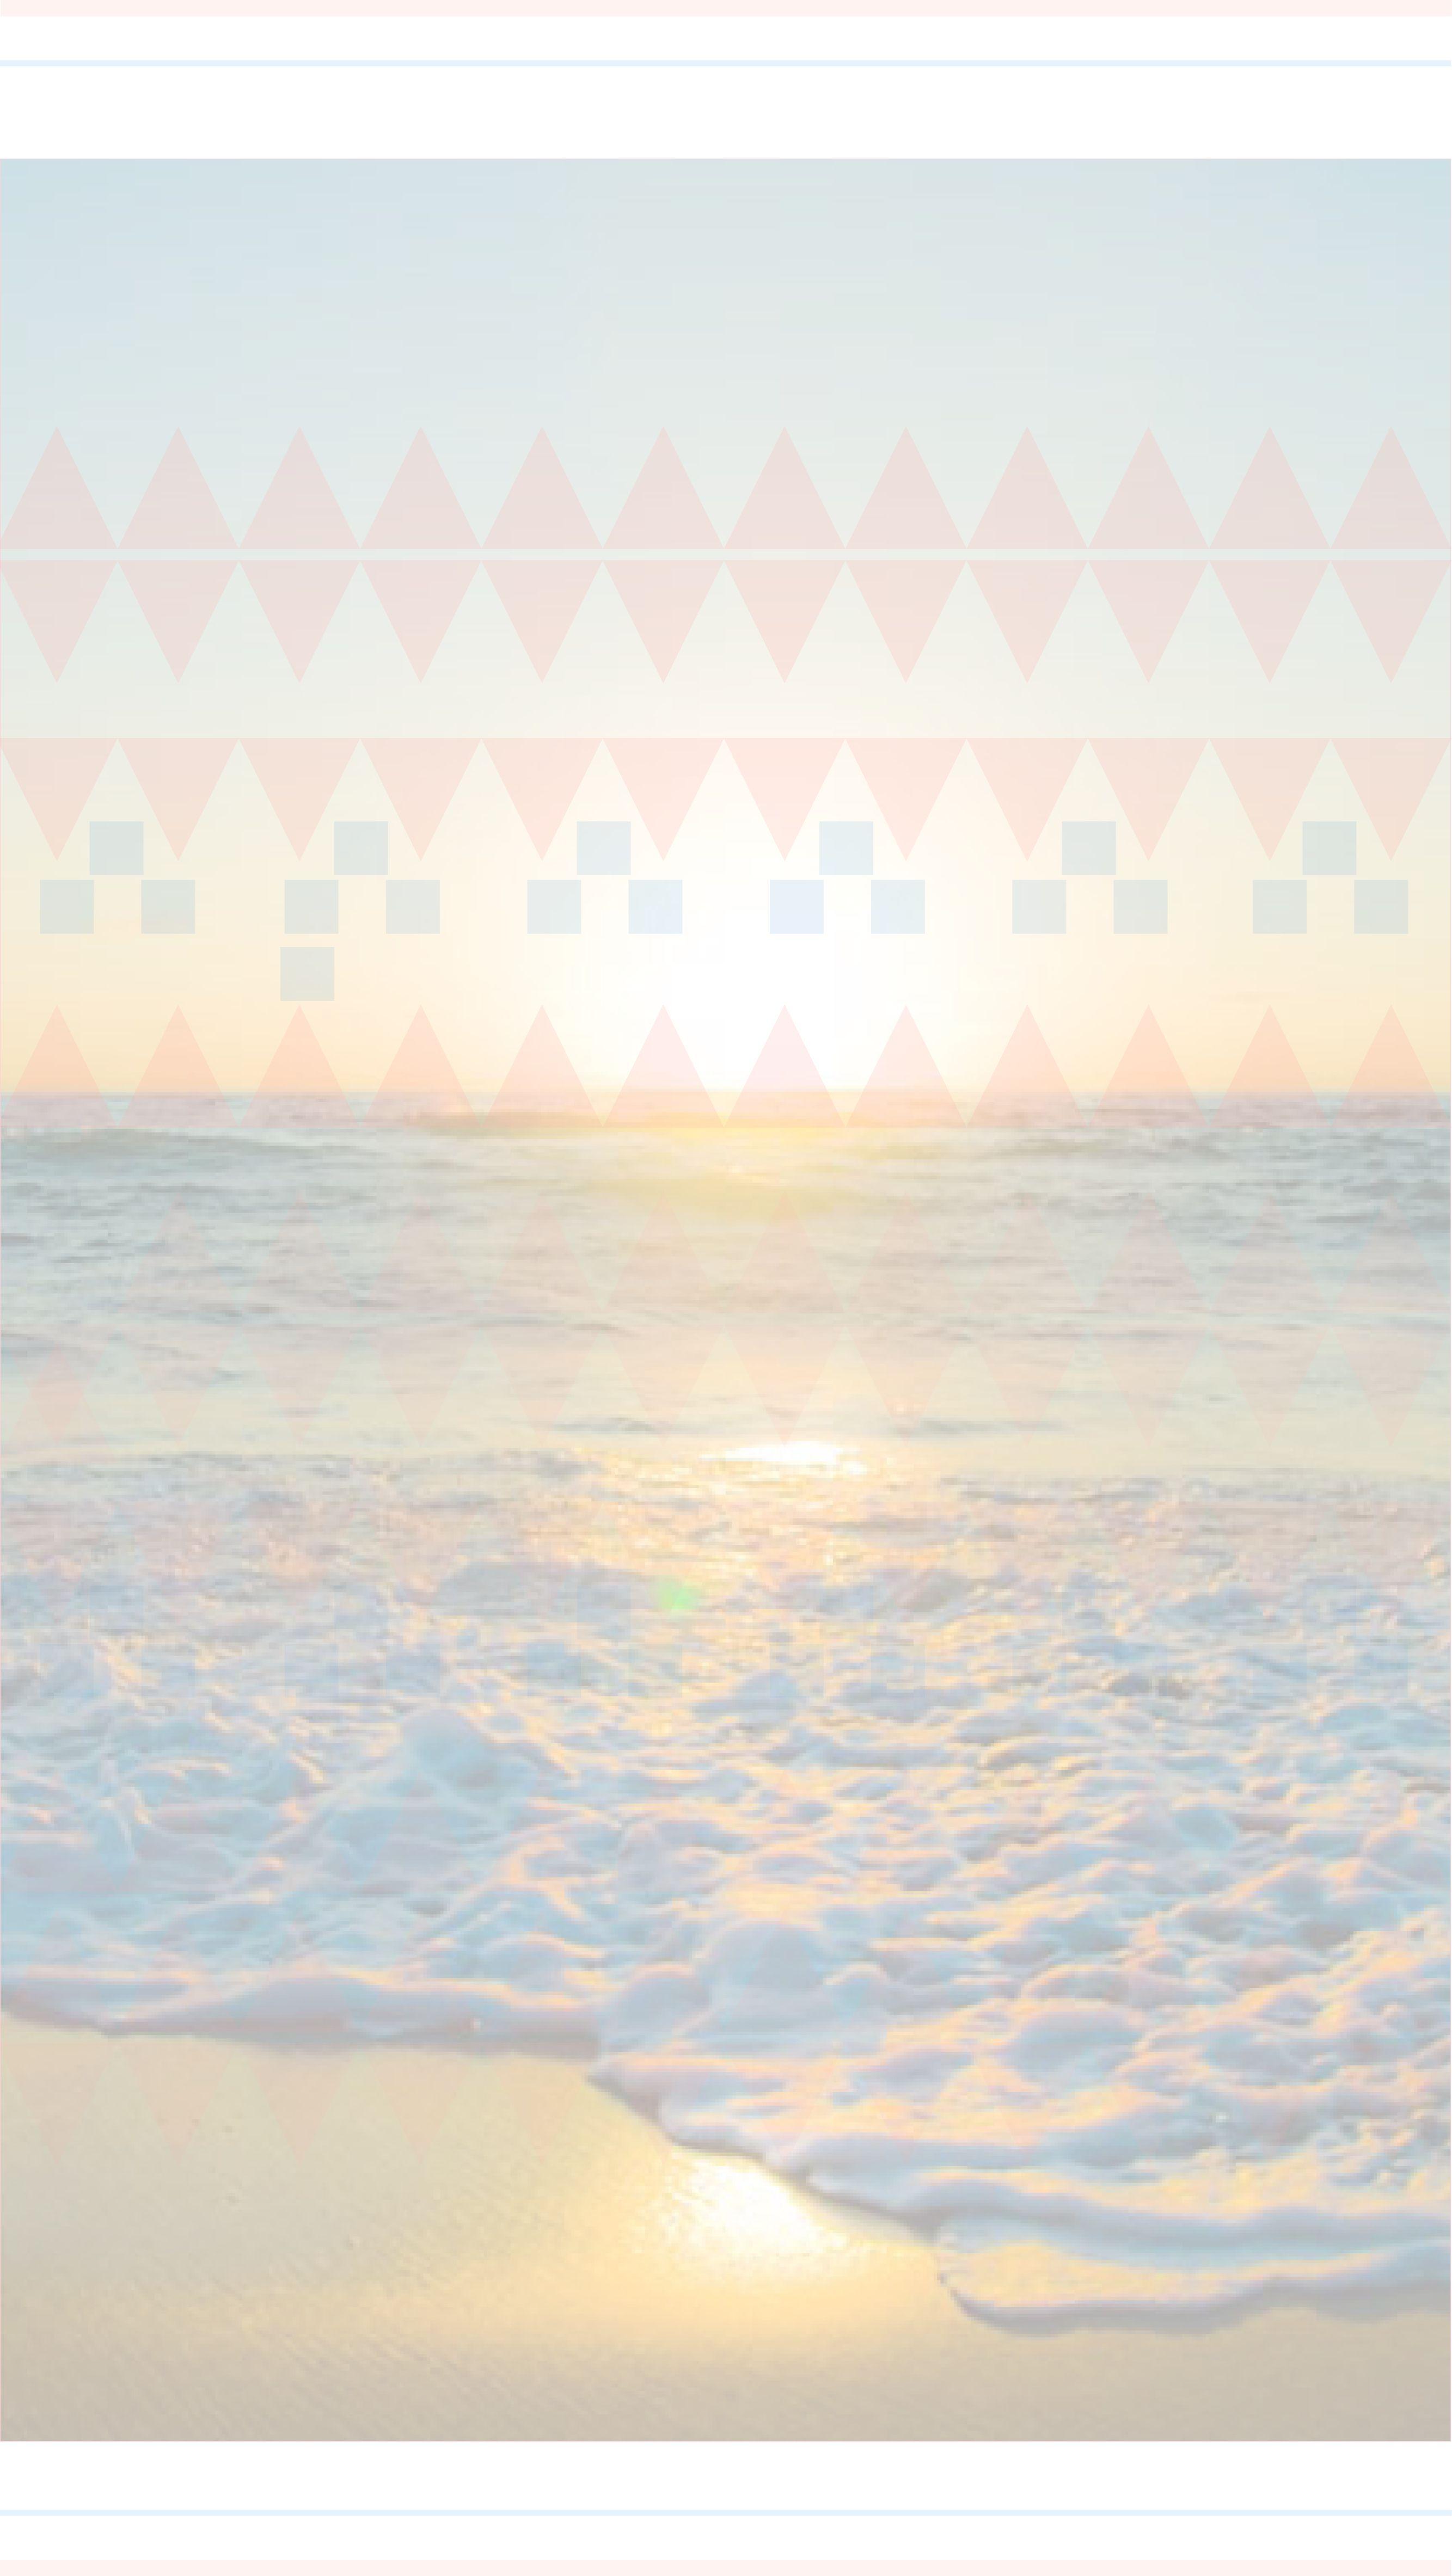 pastel aztec sea beach view ocean sunset iphone phone